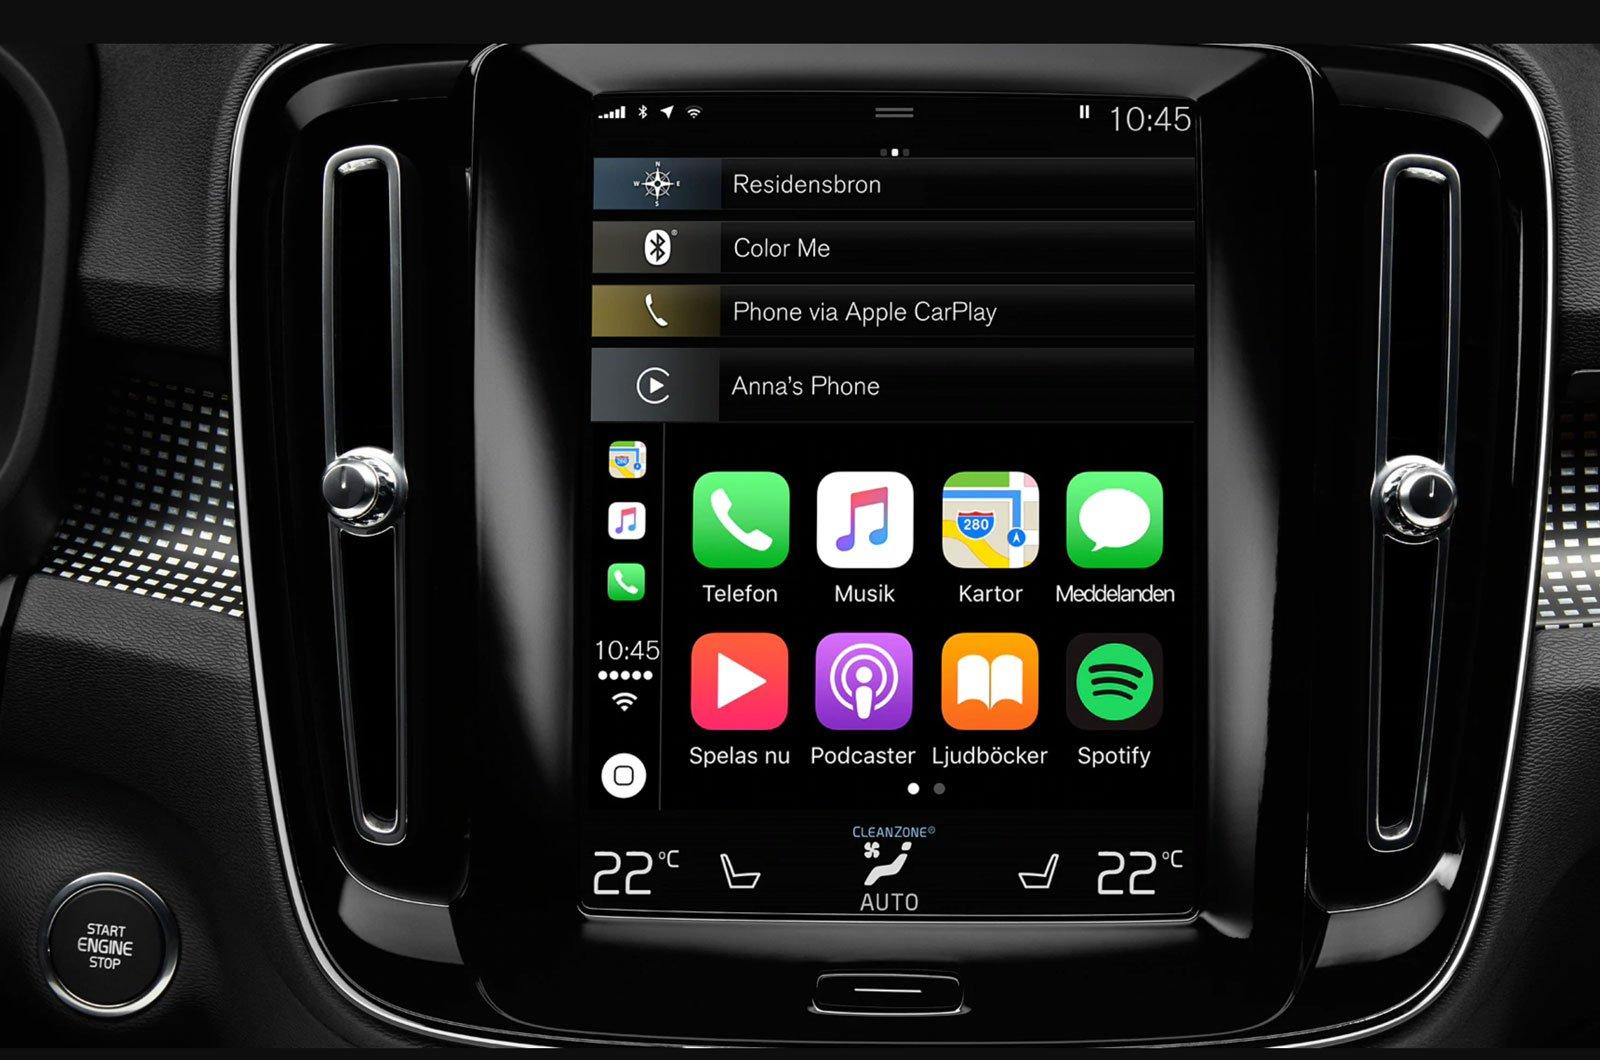 Volvo XC40 smartphone mirroring